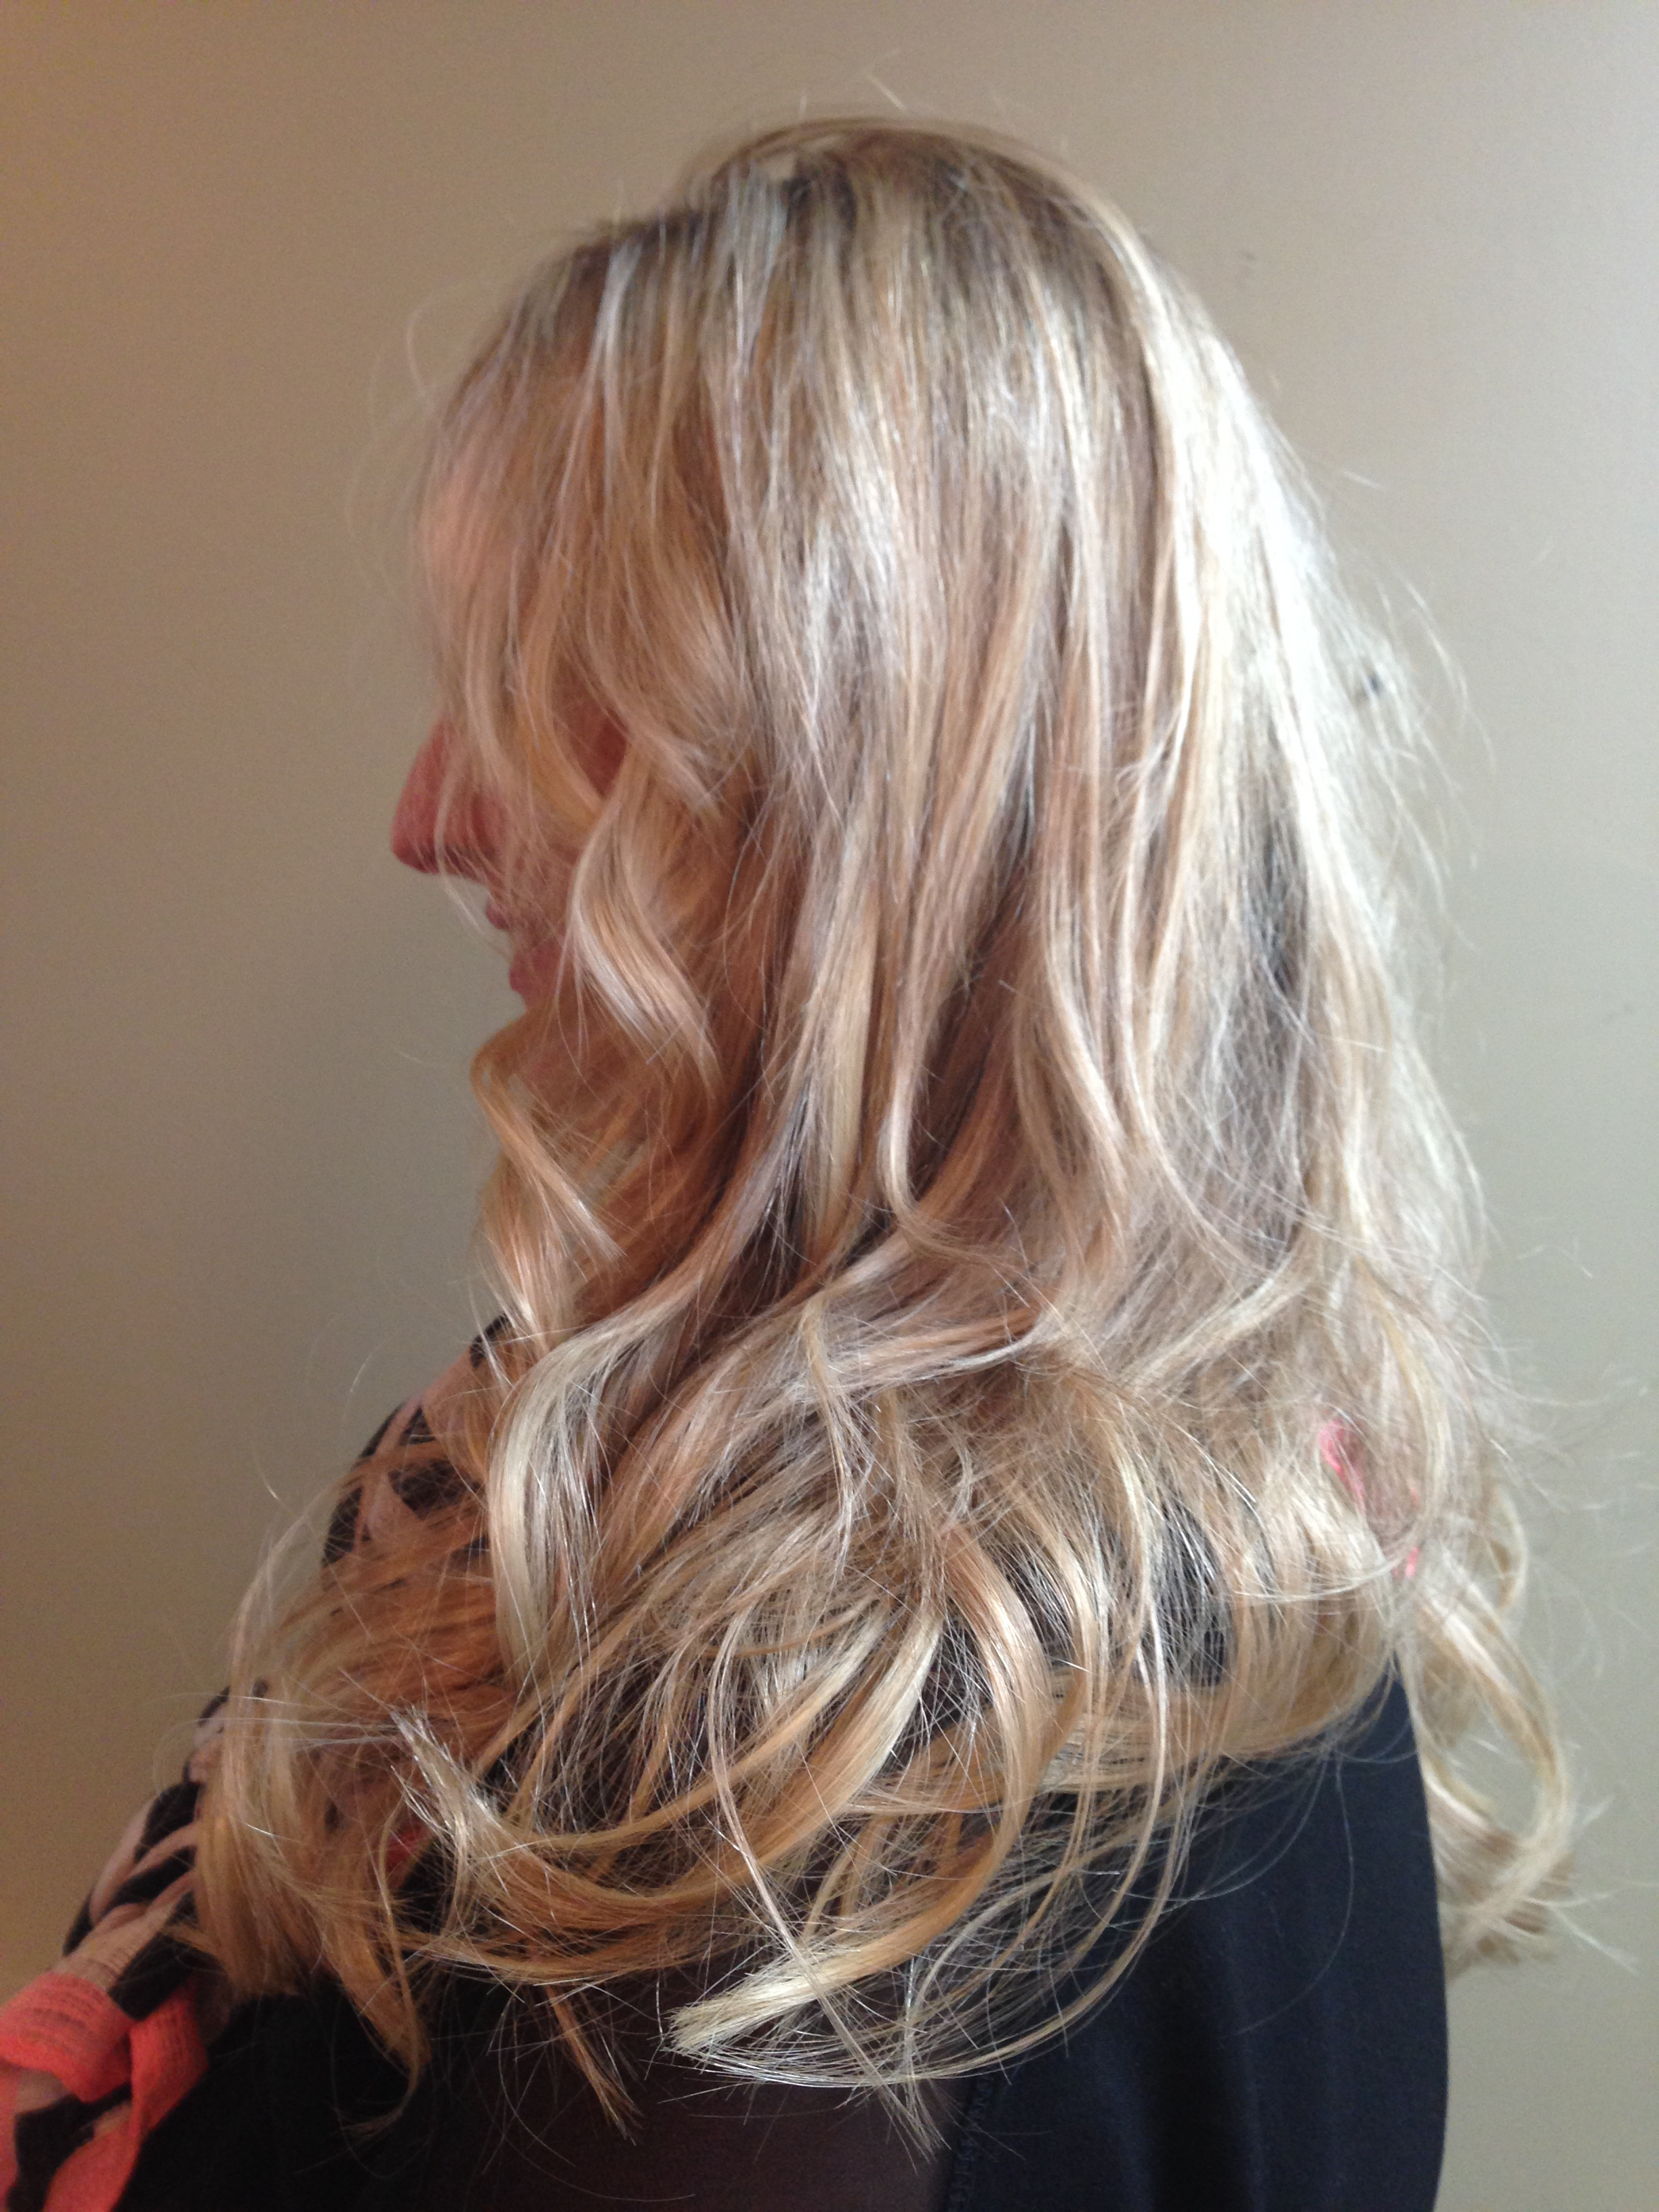 Affordable Help For Hair Loss Hair Extensions Thinning Hair Hair